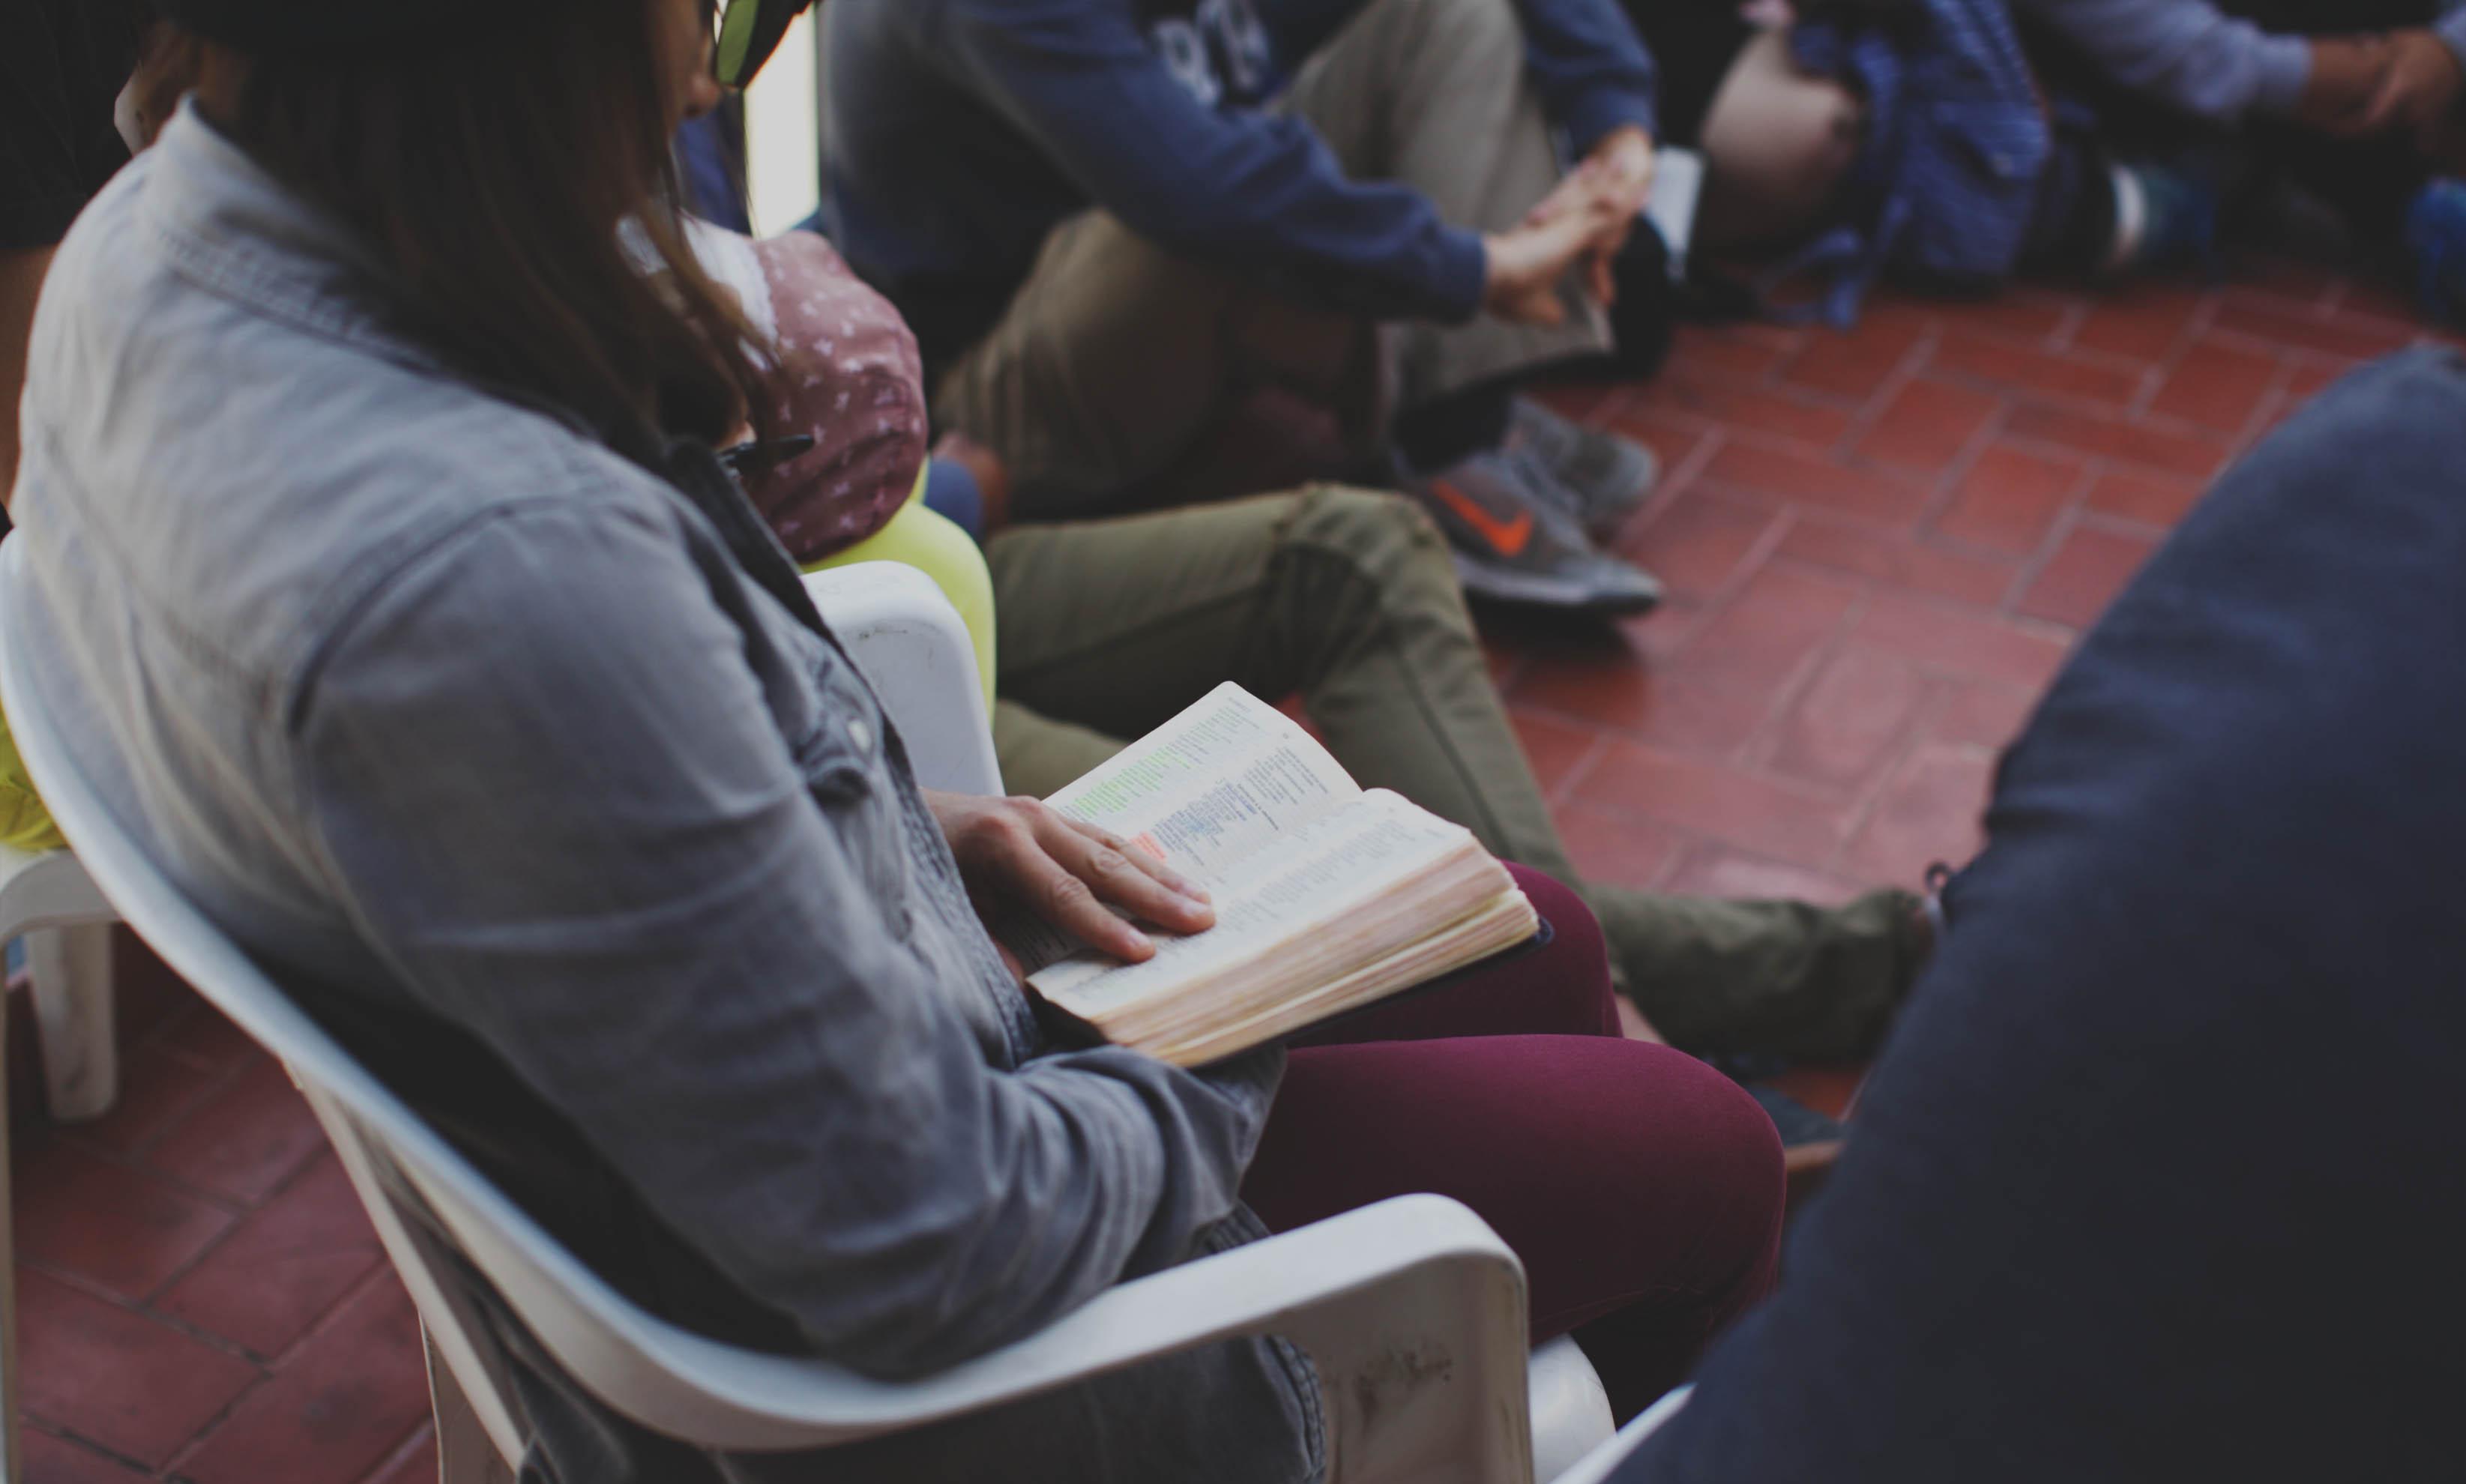 YWAM BSN TESTIMONY - Take Your Bible Off The Shelf